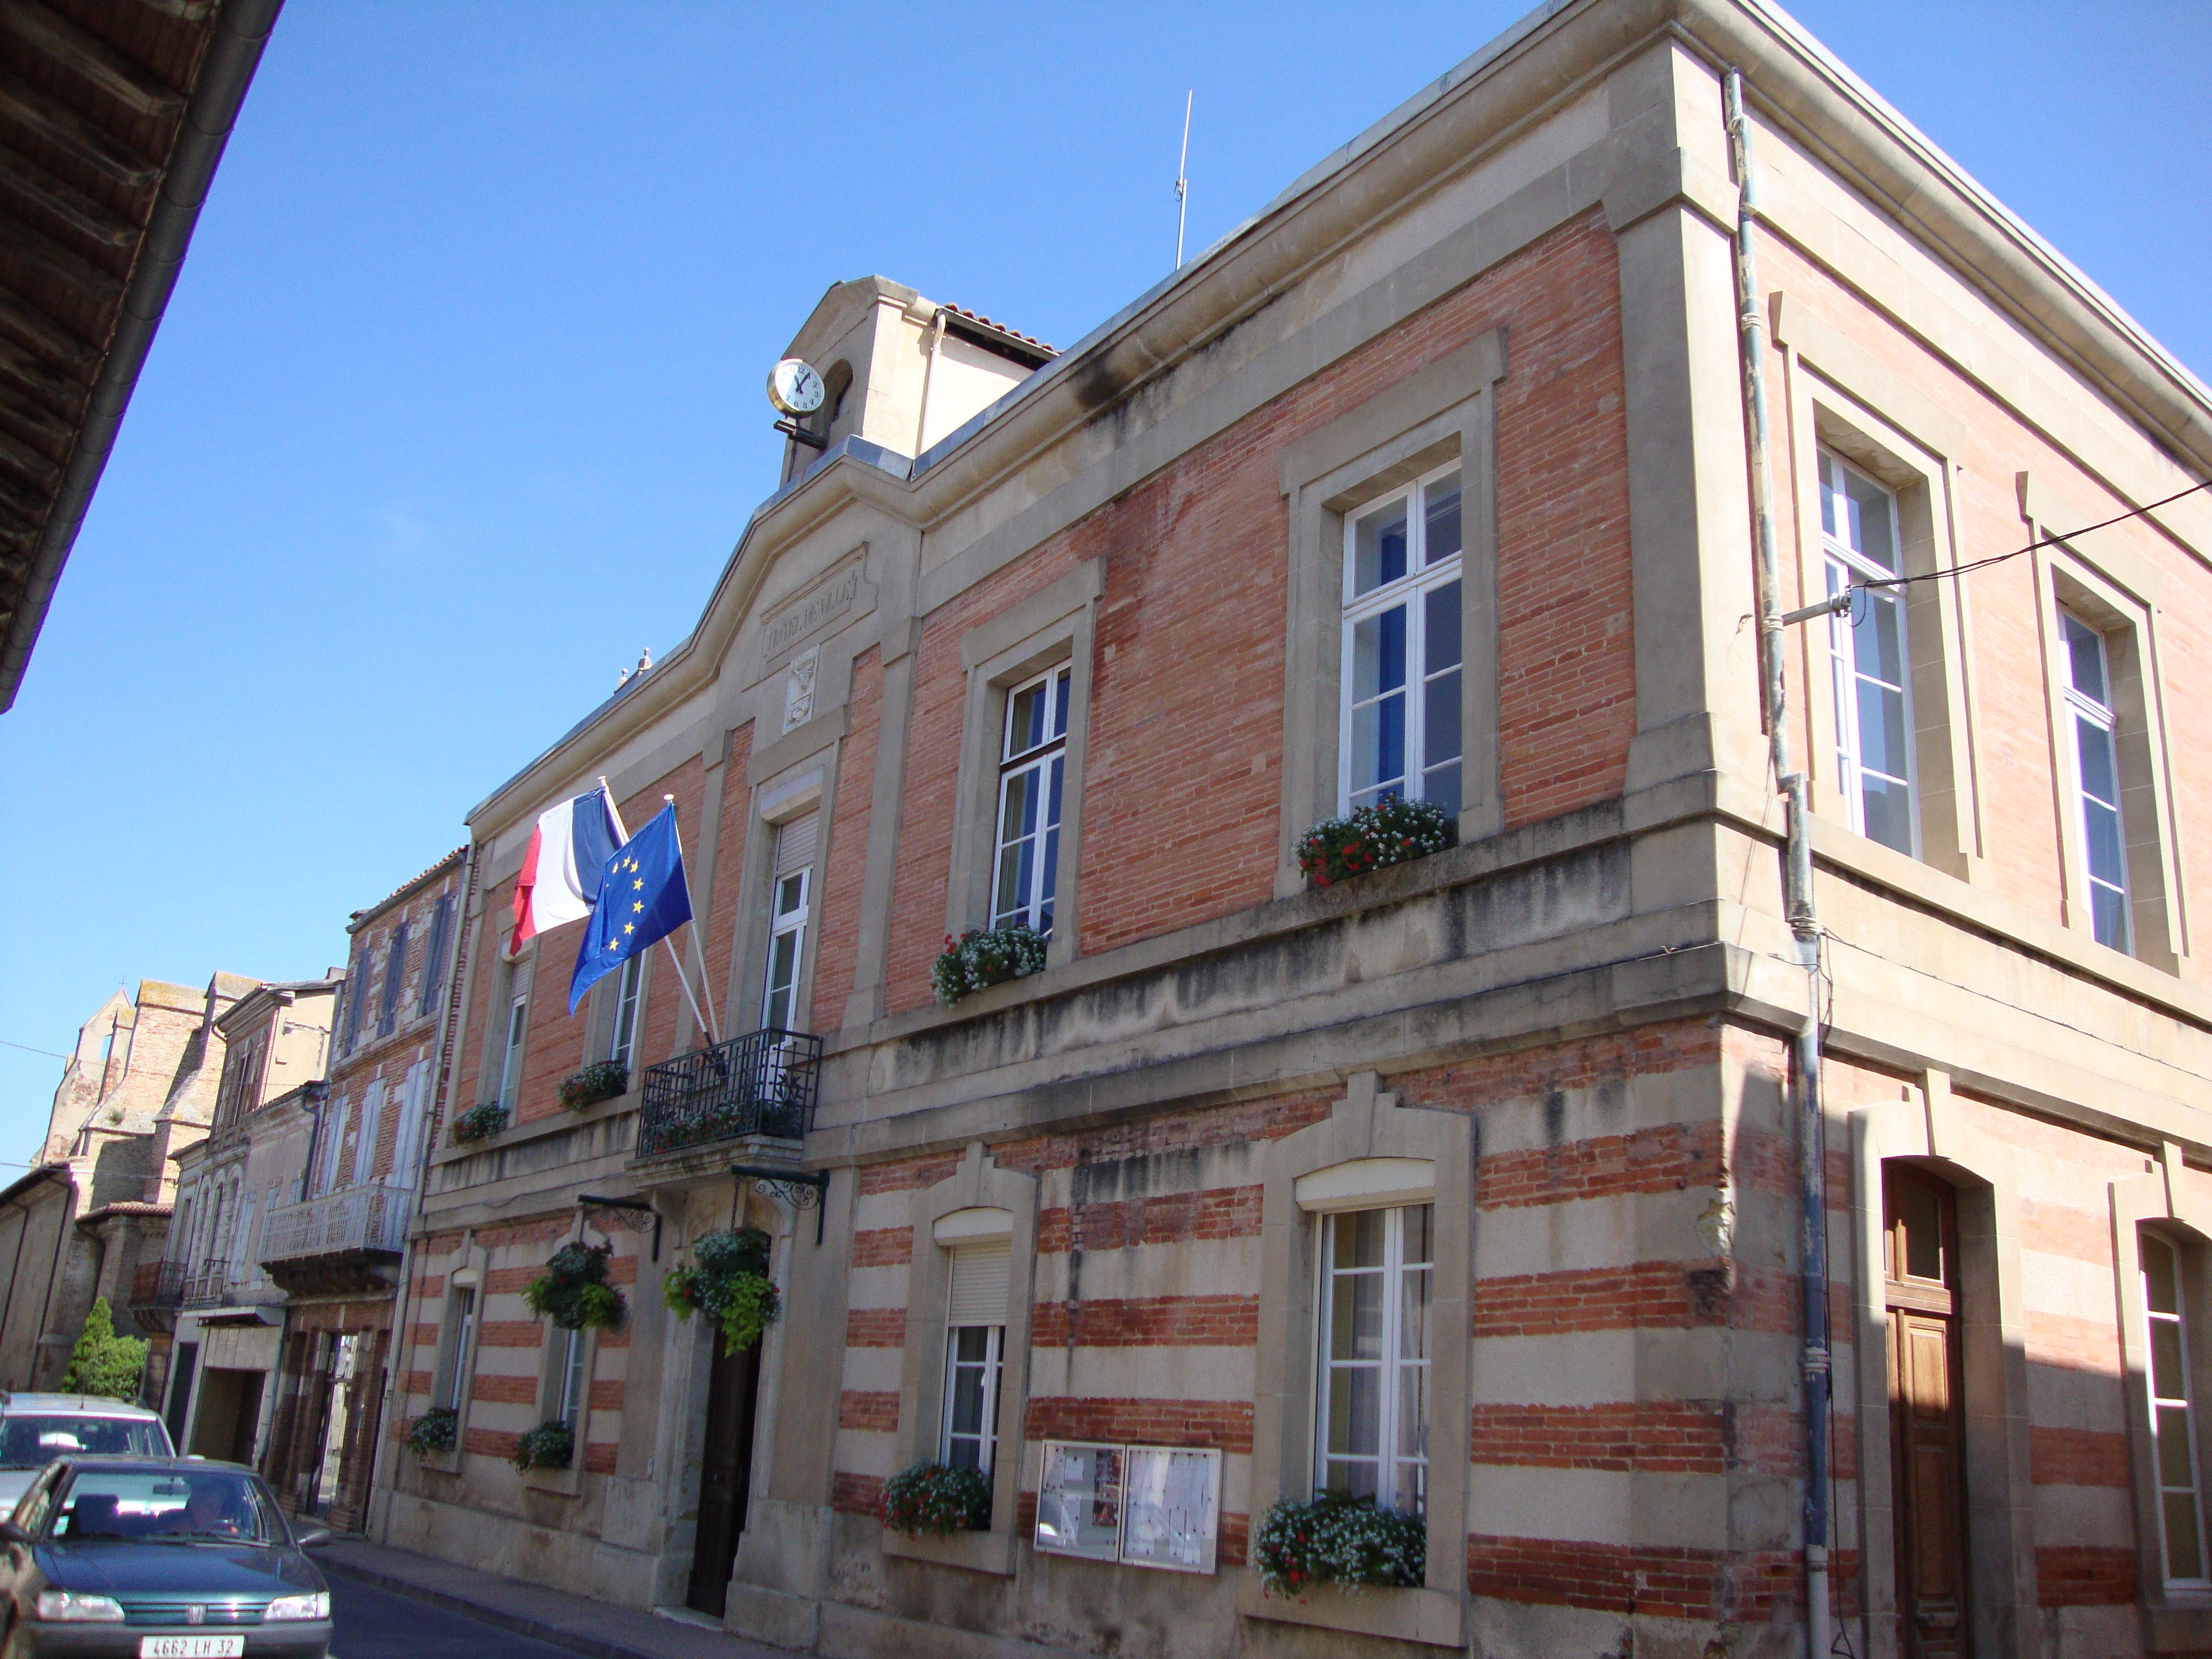 Rencontre Coquine Jeune Femme à Marseille